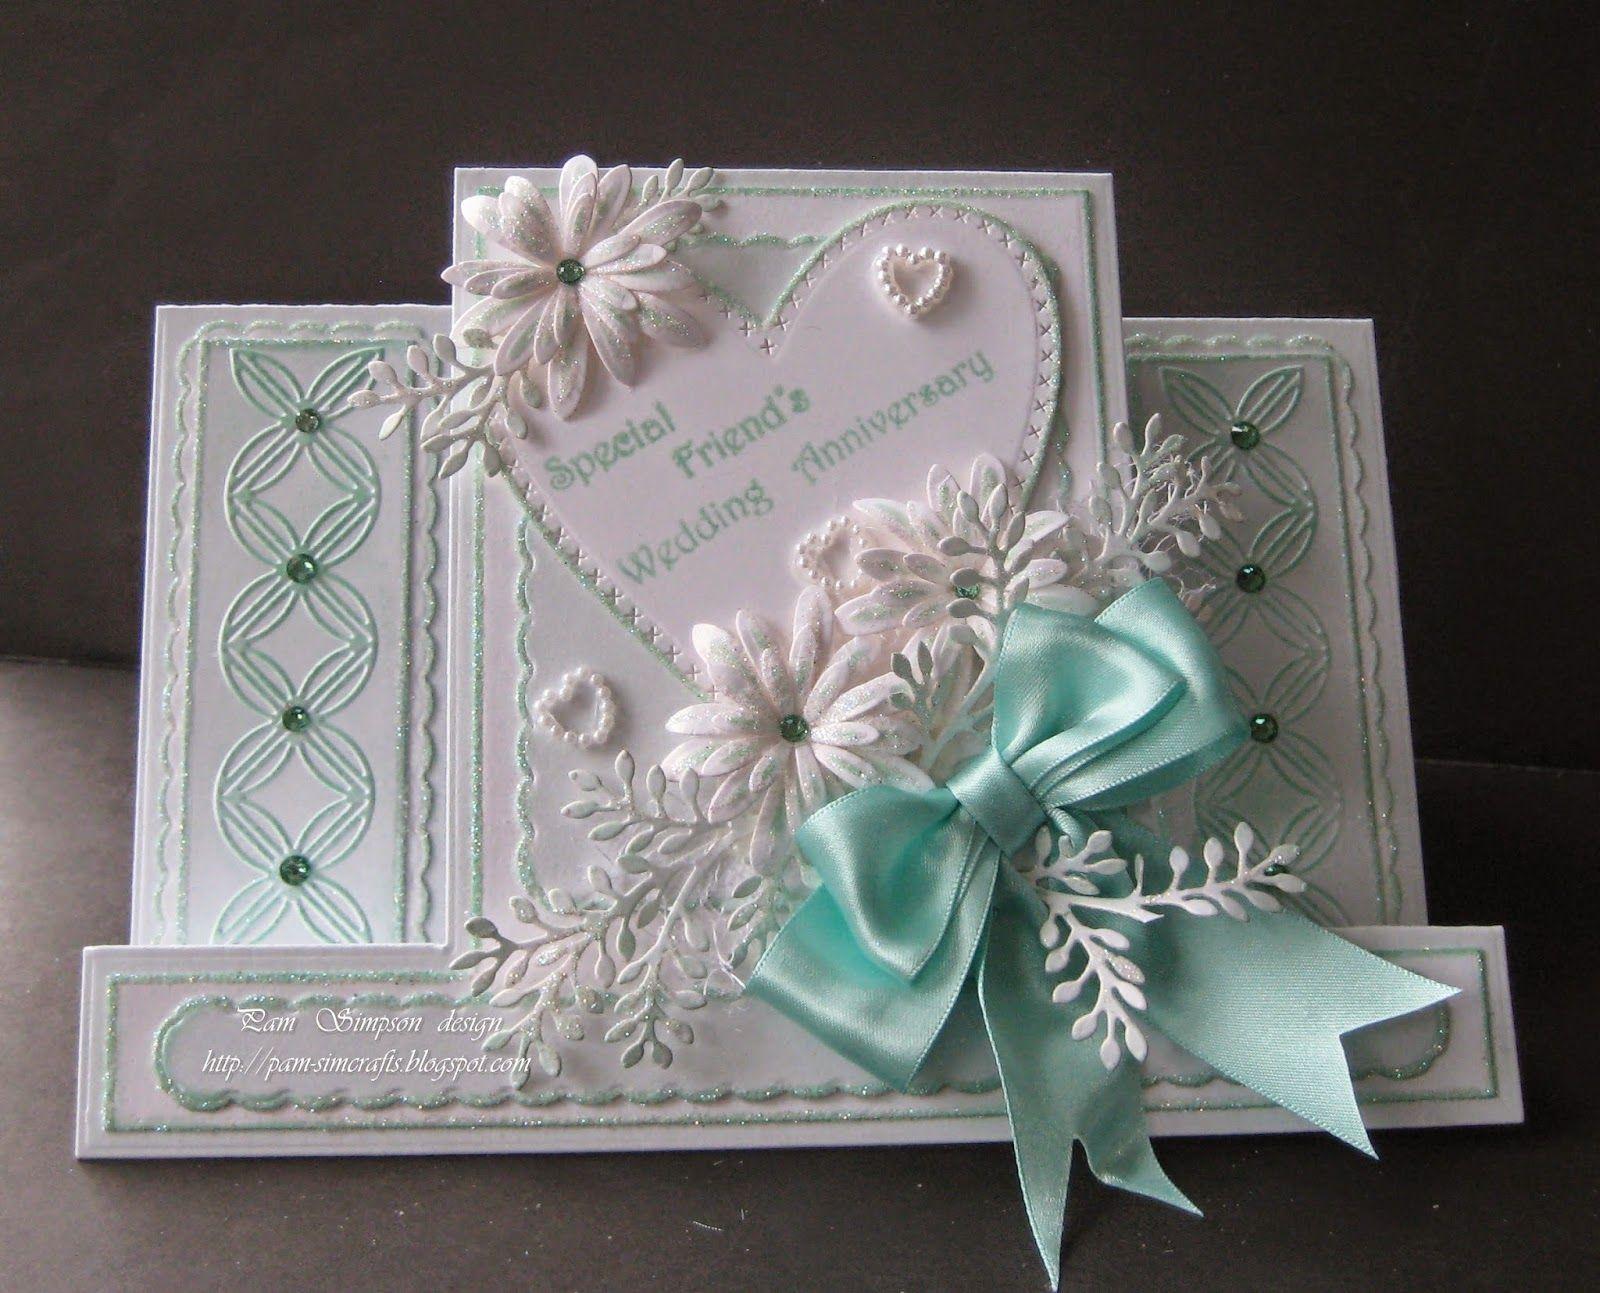 Friends Wedding Anniversary Card Wedding Anniversary Cards Anniversary Cards Center Step Cards